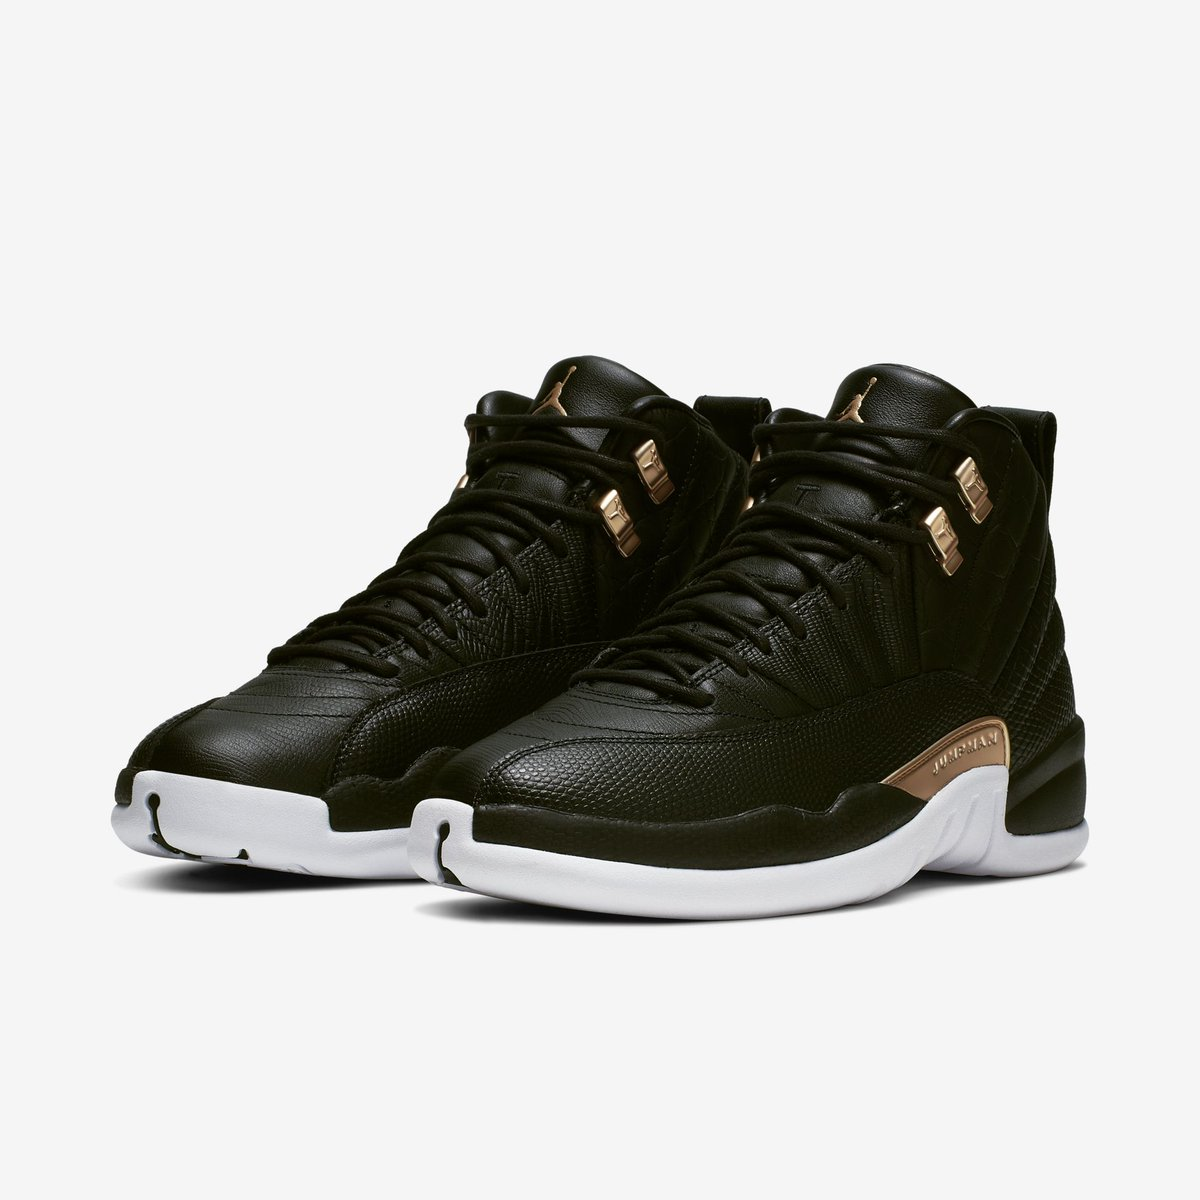 "2317309ac51 Jordan 12 Retro WMNS ""Black/Reptile"" back in more sizes 10am ET Finish Line  -> https://go.j23app.com/c1e JD Sports -> https://go.j23app.com/c1f ..."